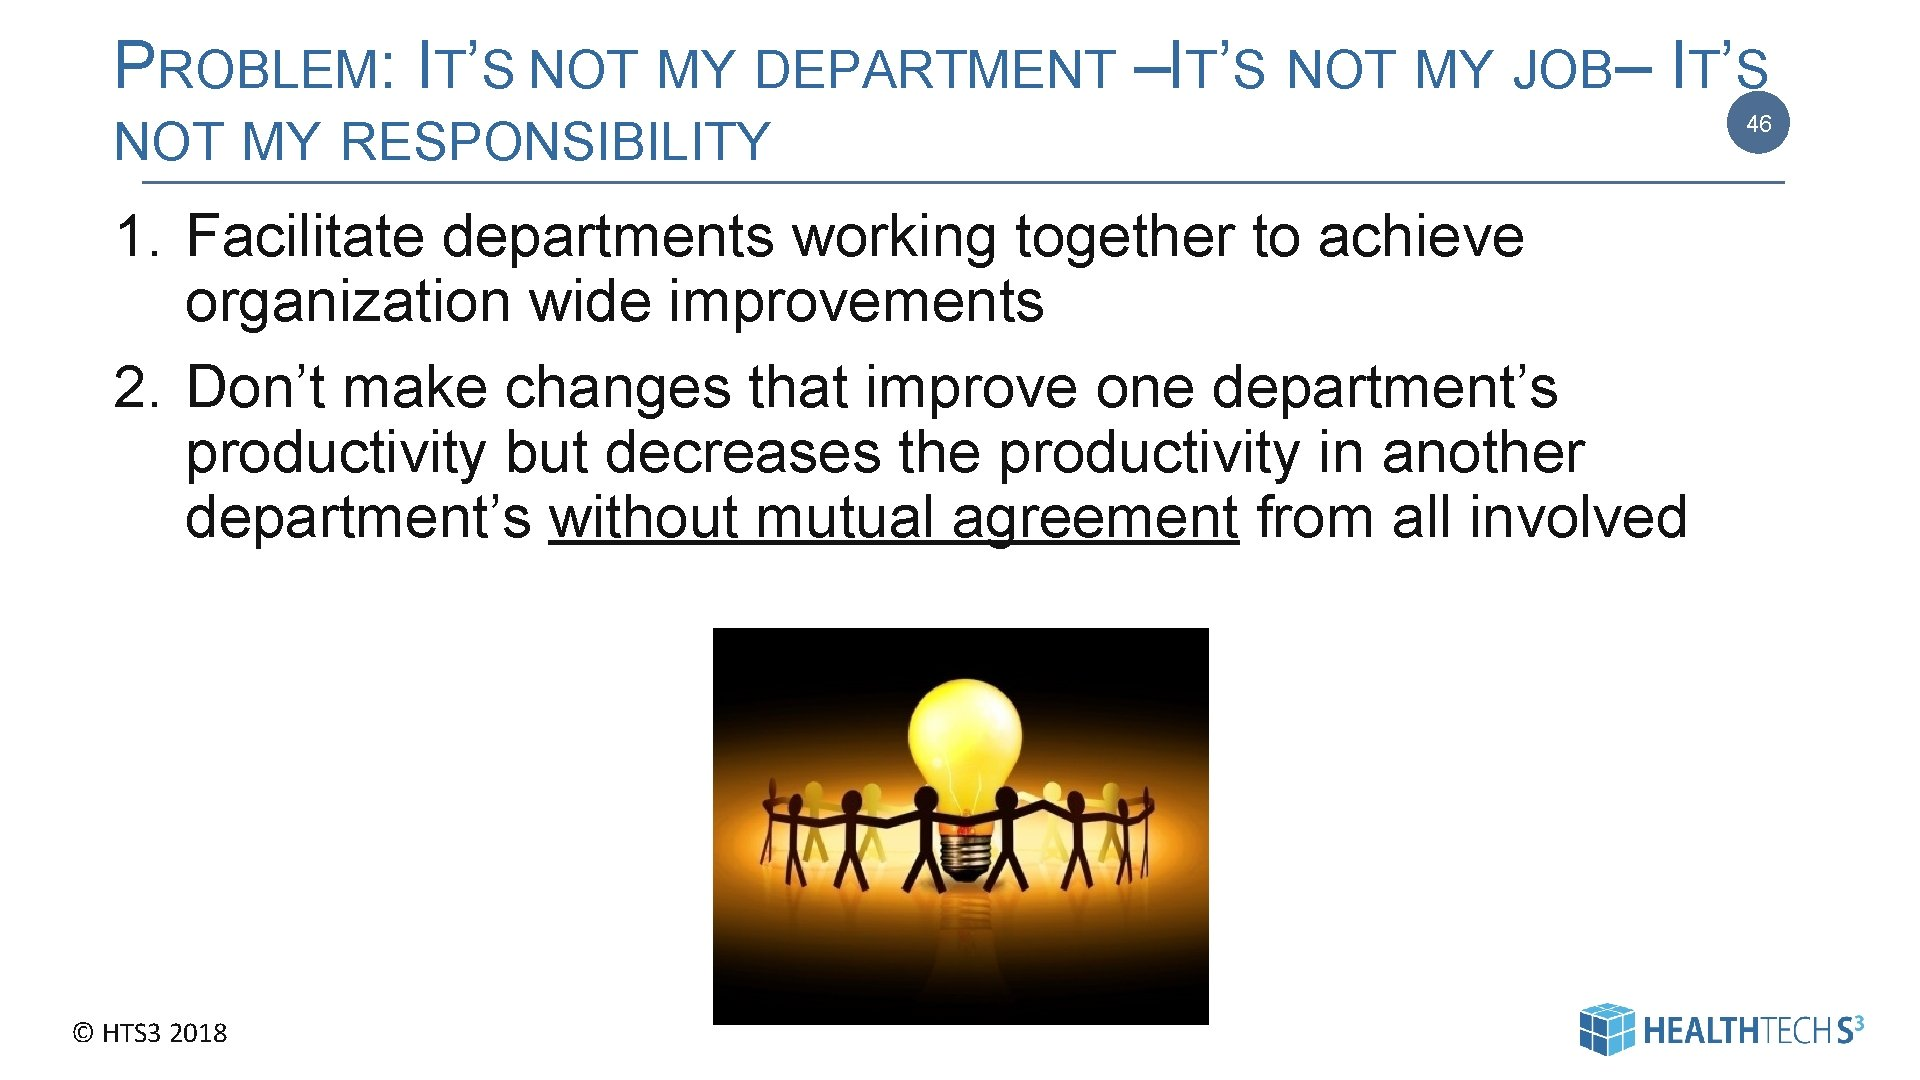 PROBLEM: IT'S NOT MY DEPARTMENT – IT'S NOT MY JOB – IT'S NOT MY